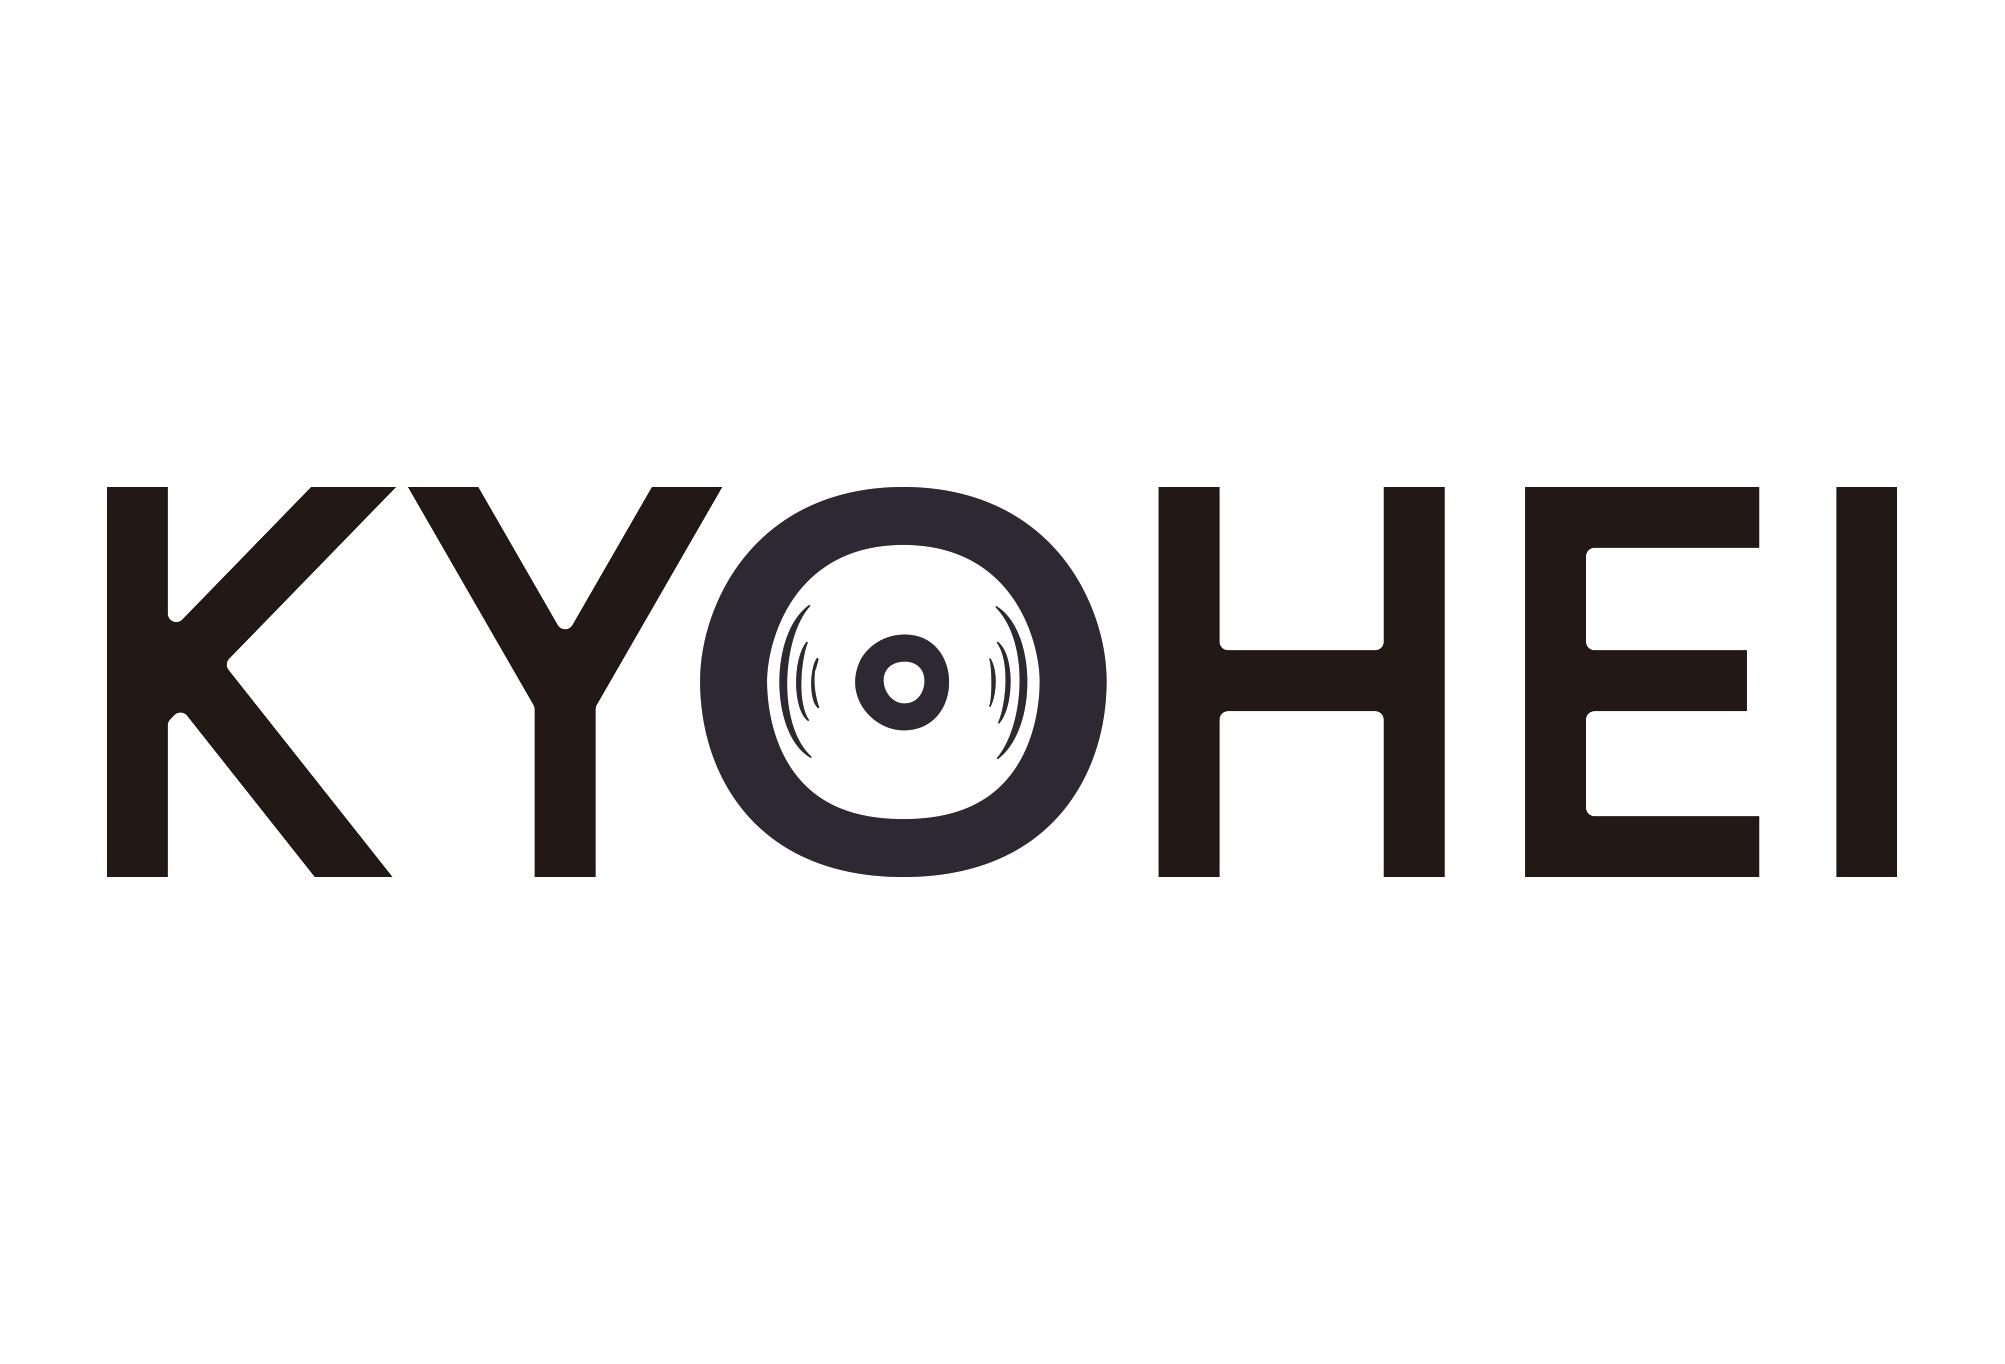 KYOHEI ミュージシャン ロゴ